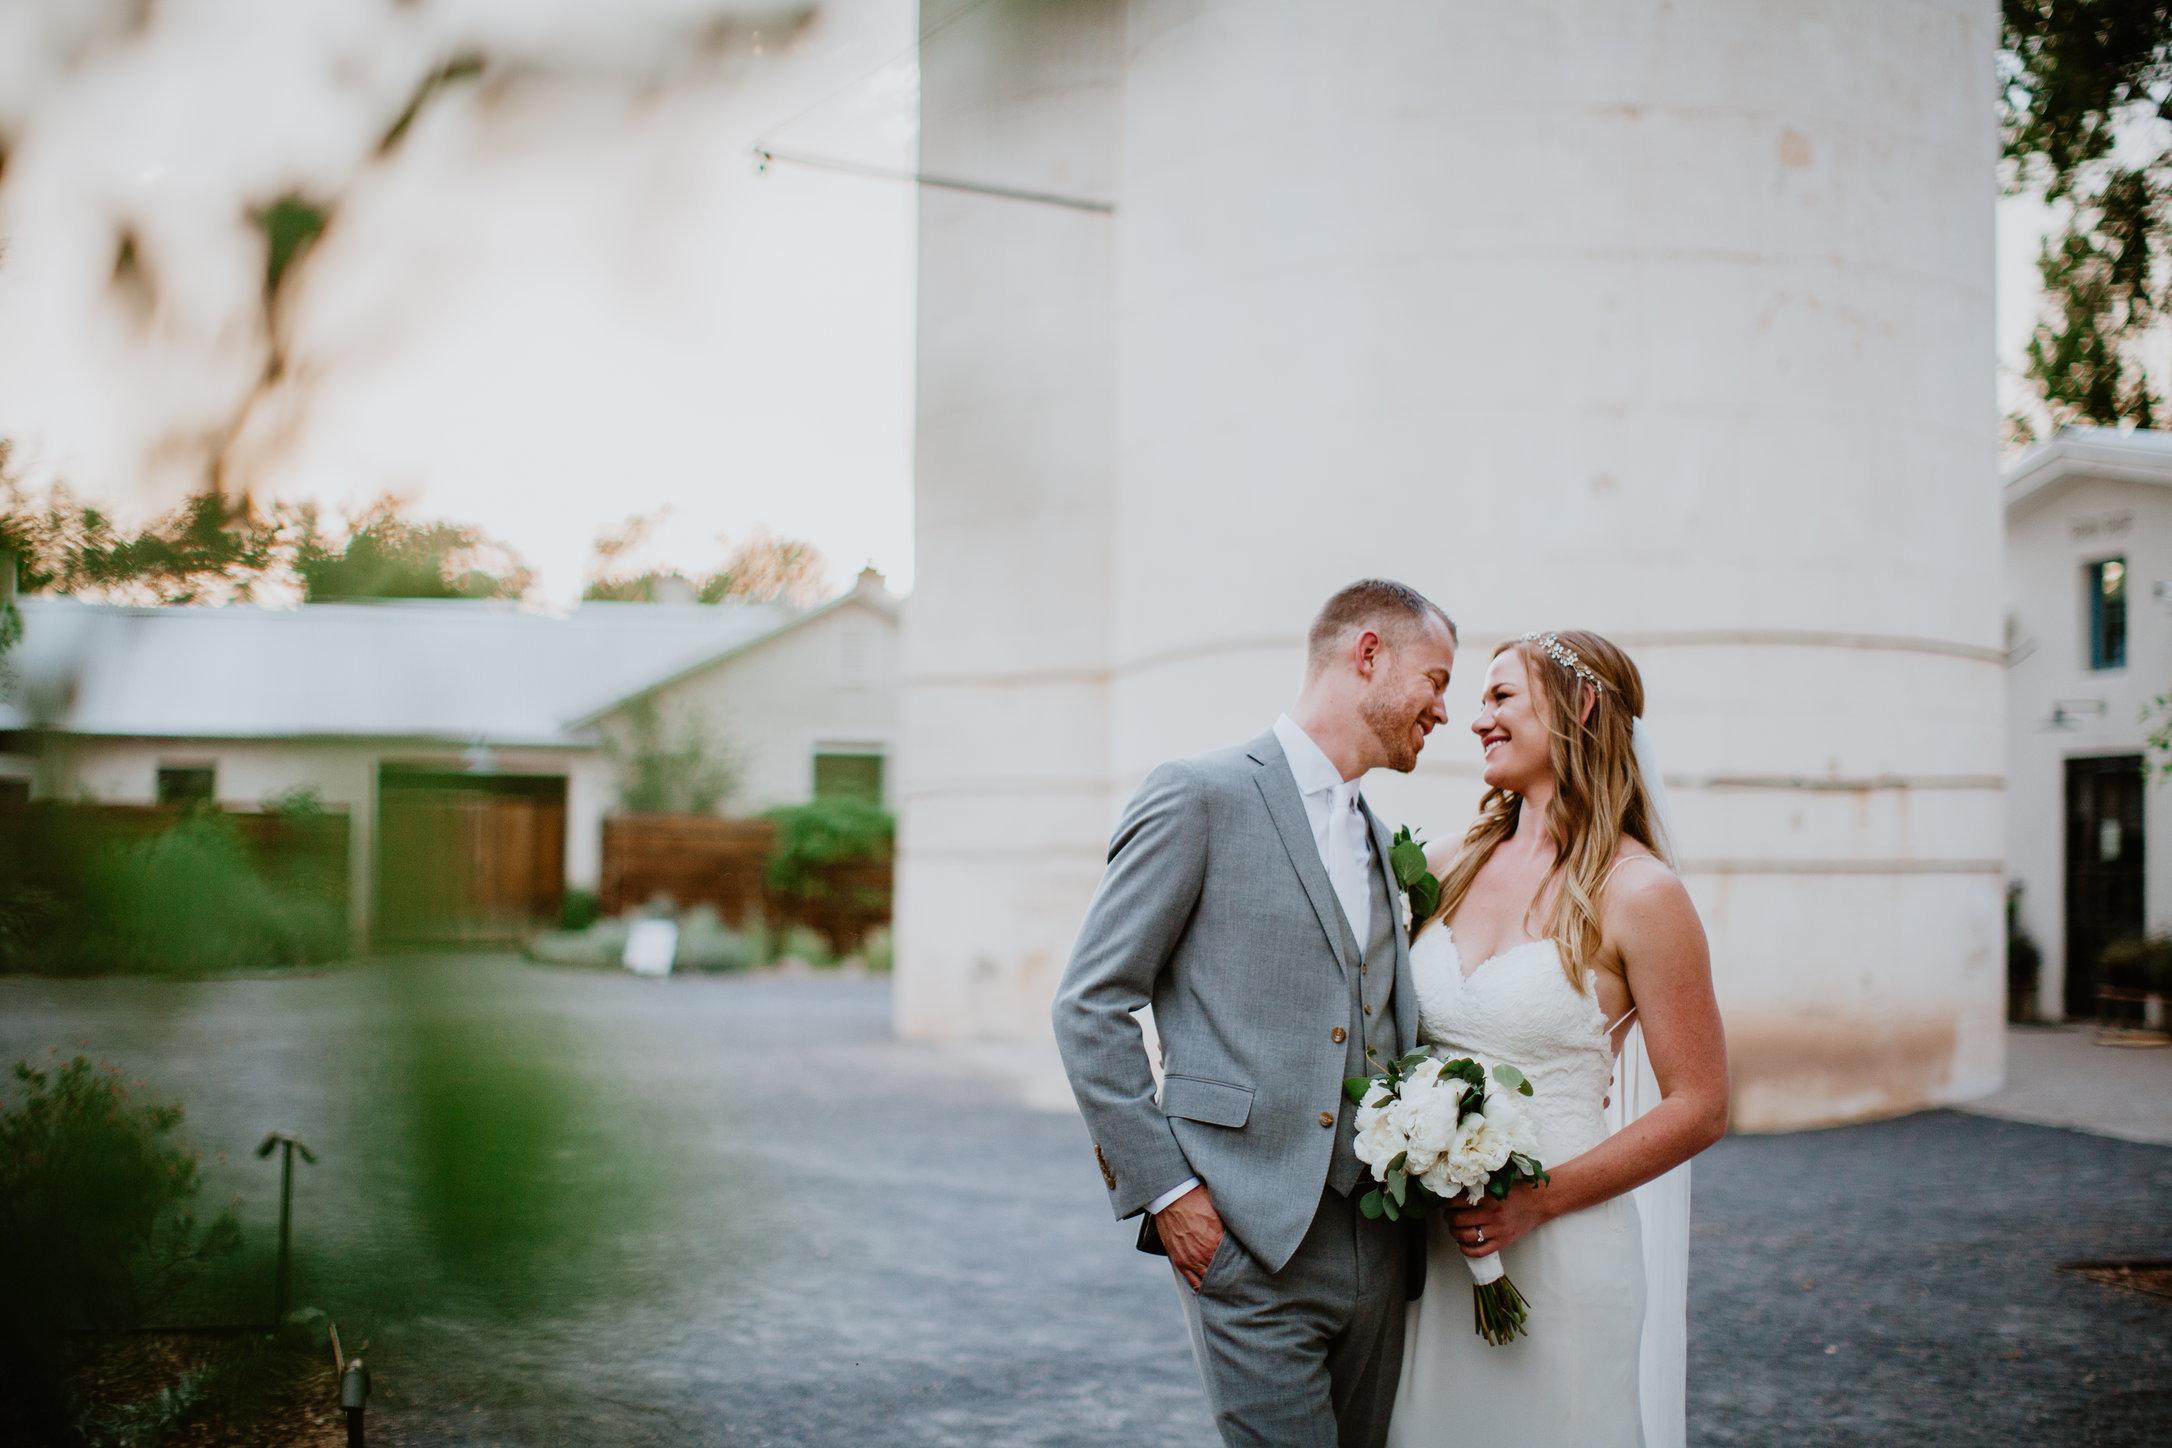 DandA-wedding-761.jpg